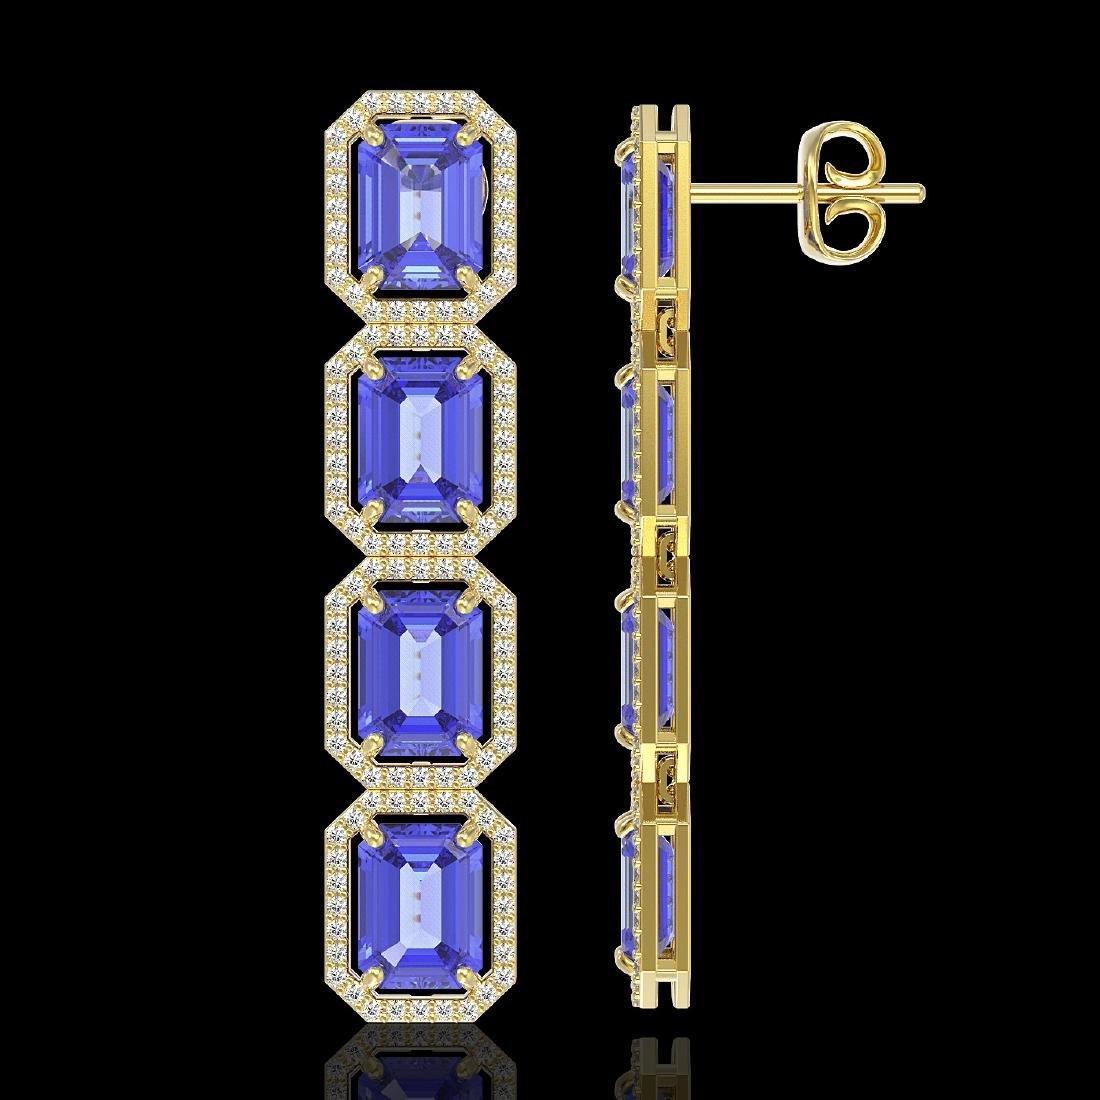 19.39 CTW Tanzanite & Diamond Halo Earrings 10K Yellow - 2